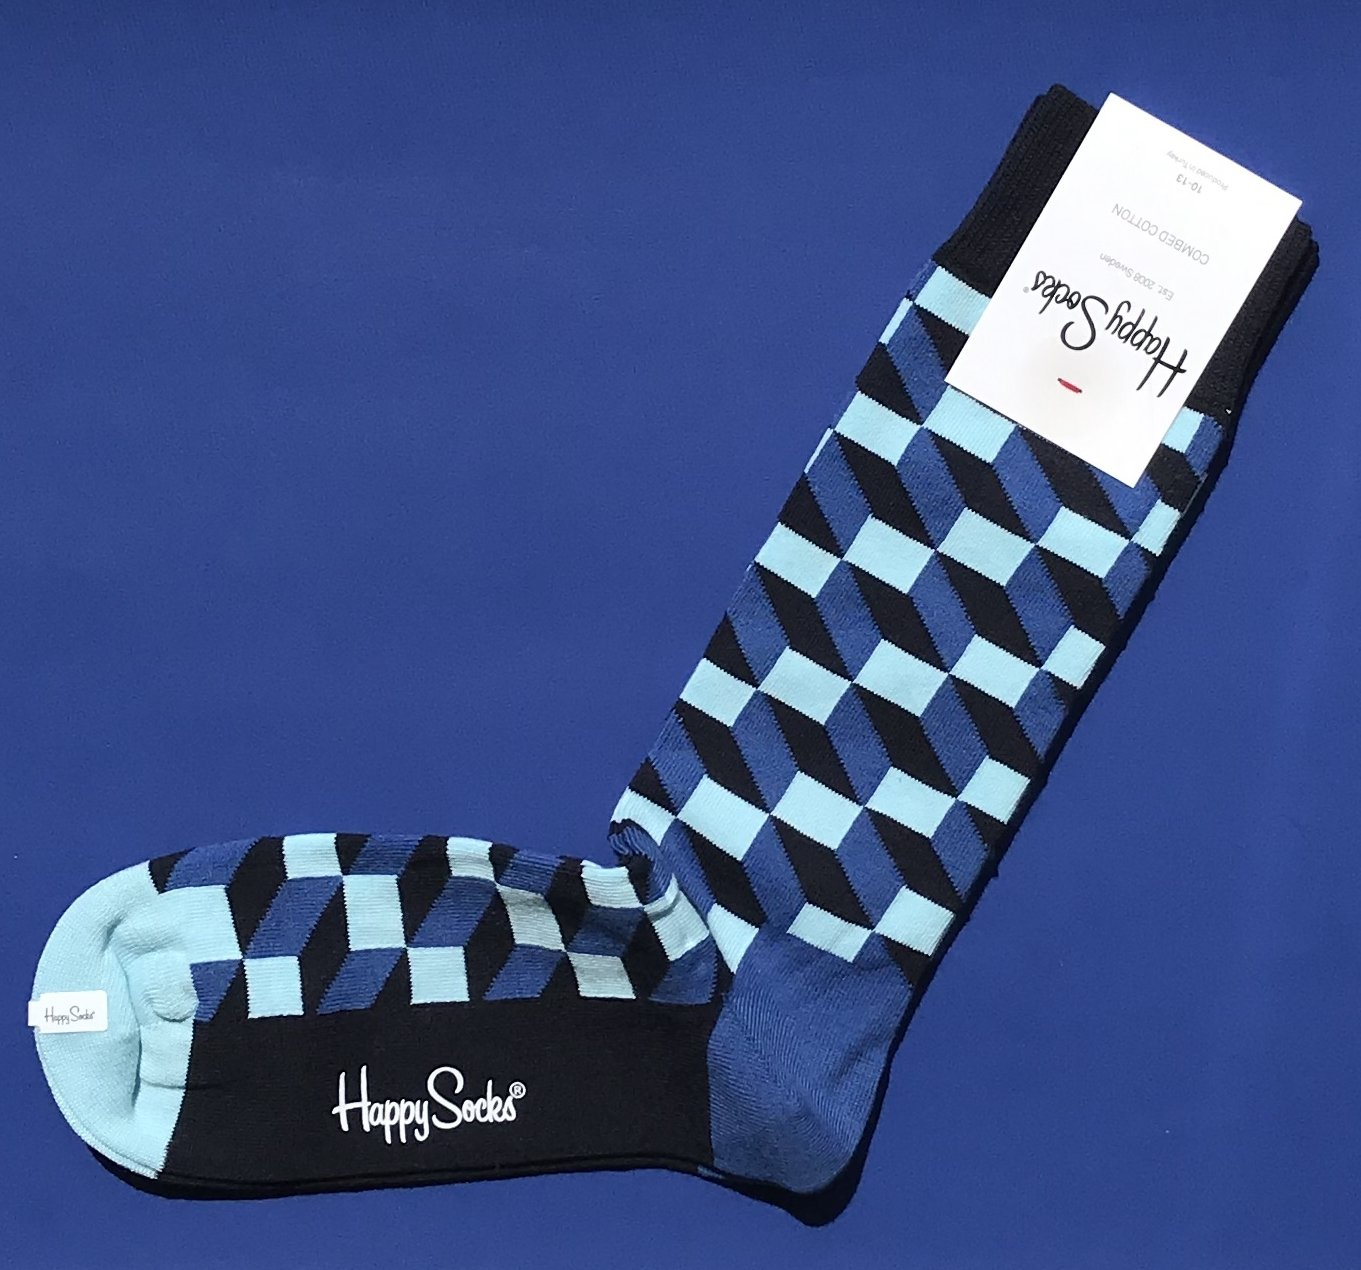 NWT Happy Socks Blue Filled Optic Cotton Socks